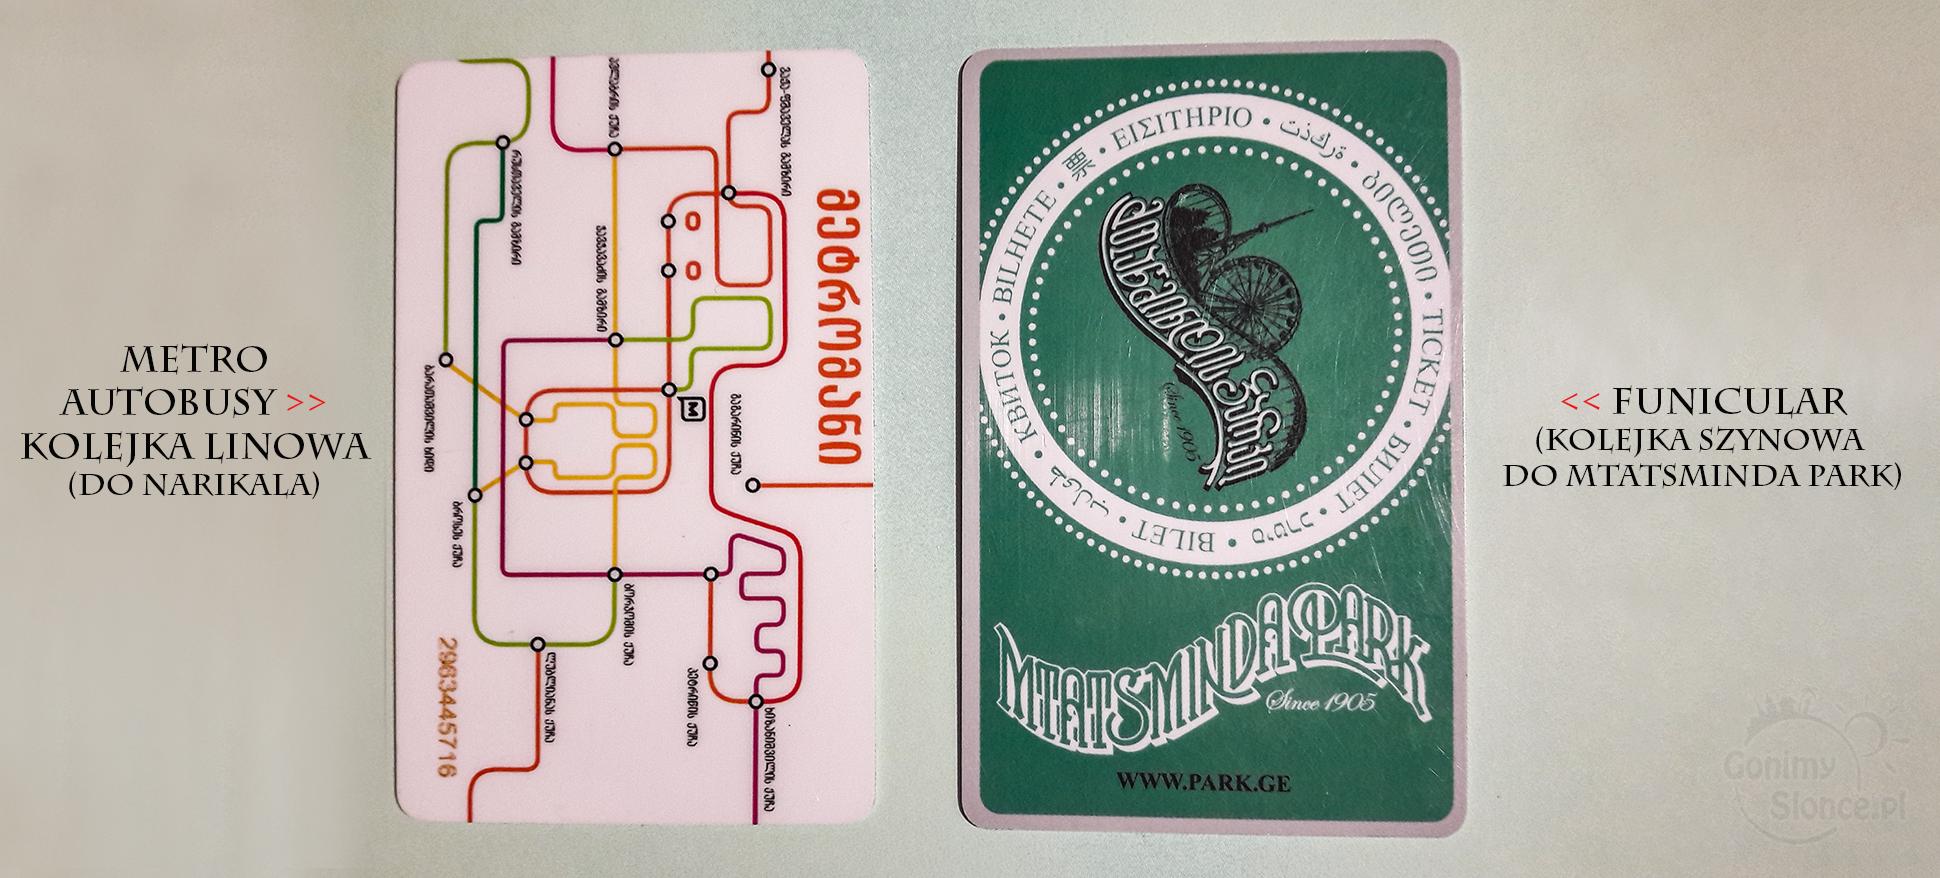 Tbilisi karty | komunikacja, kolejki, metro, funicular